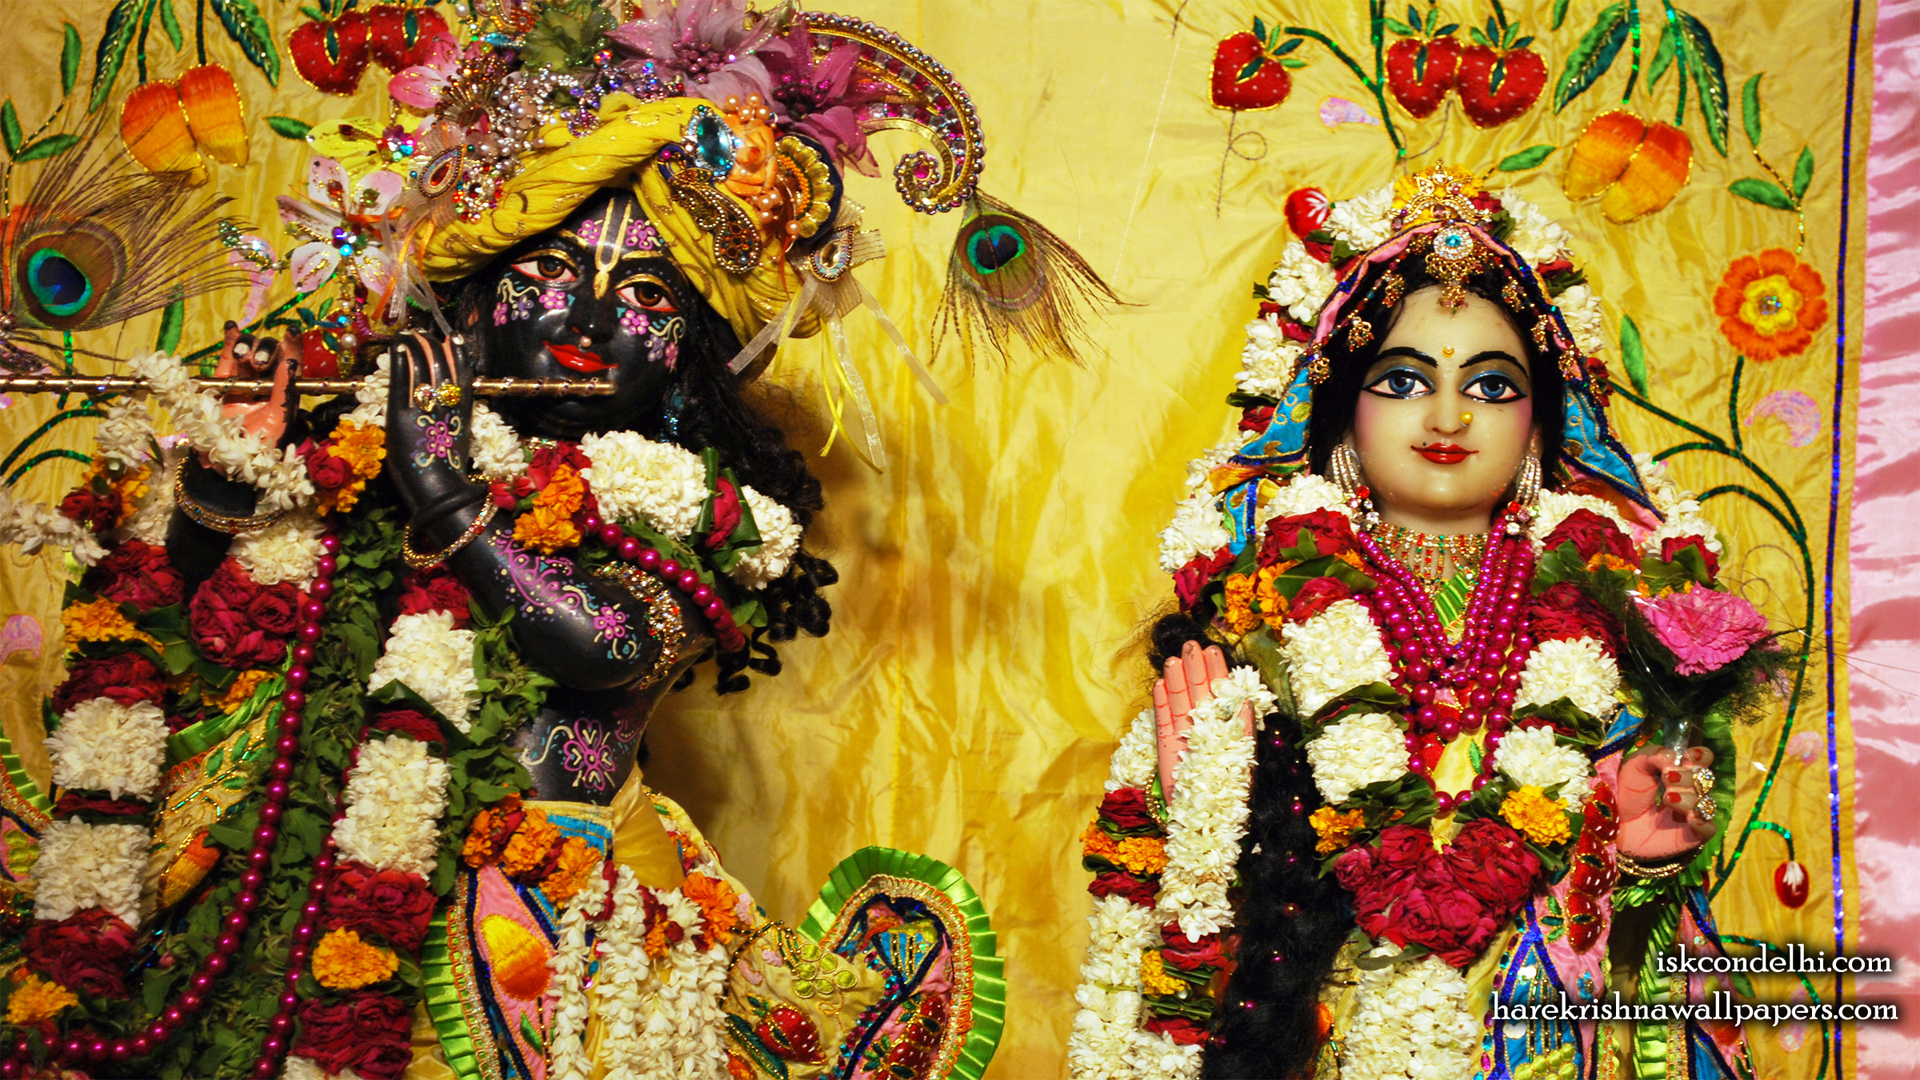 Sri Sri Radha Parthasarathi Close up Wallpaper (011) Size 1920x1080 Download